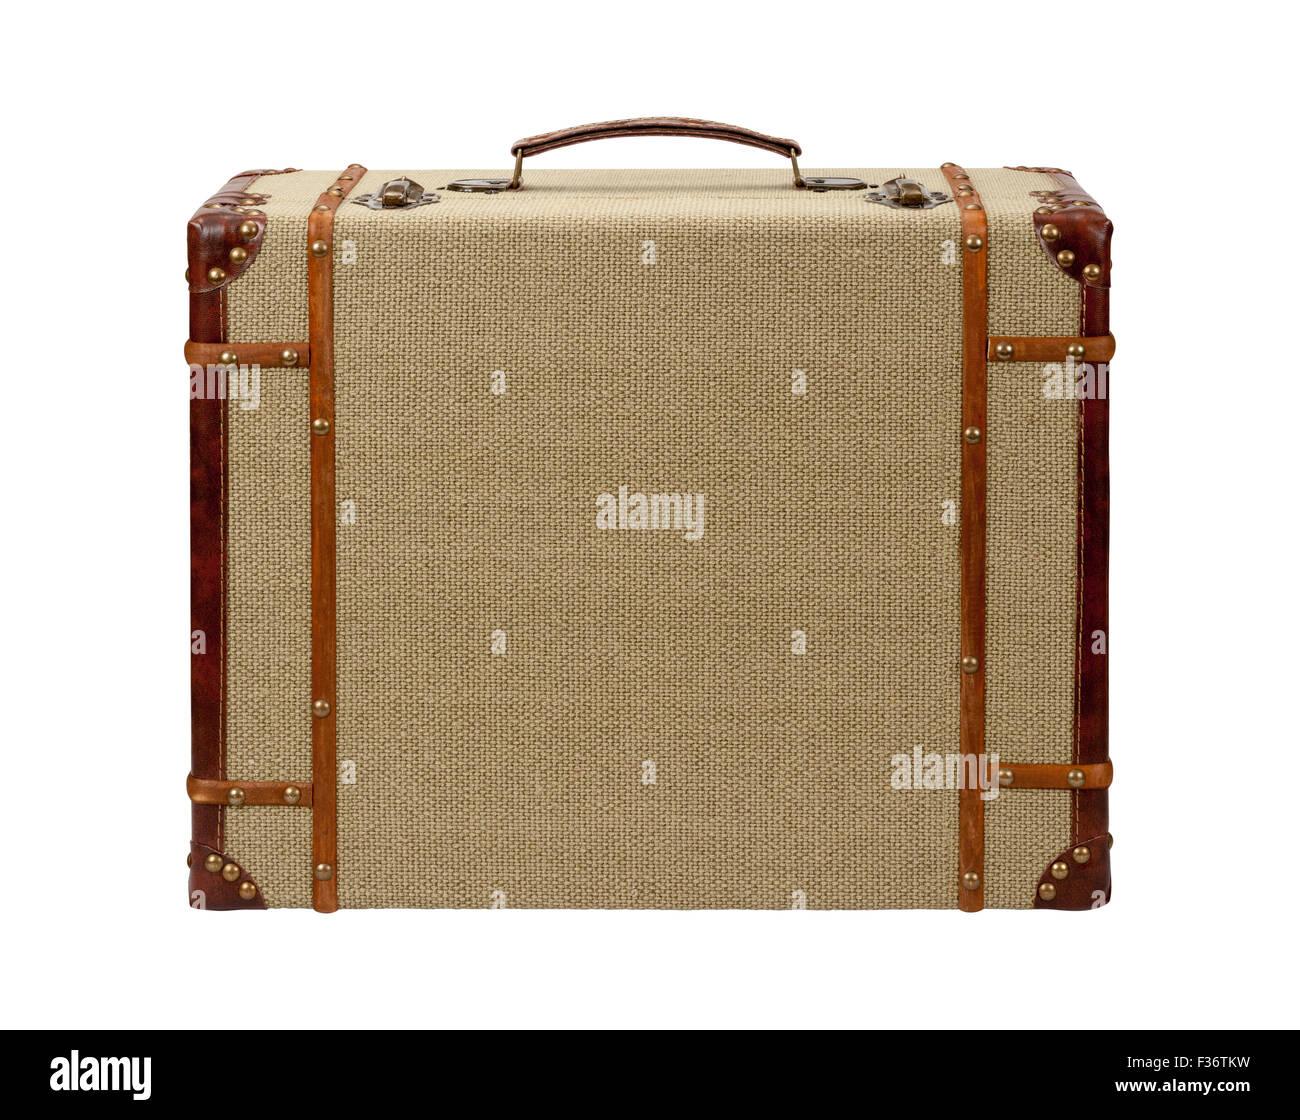 Deco Wood Burlap Suitcase - Stock Image